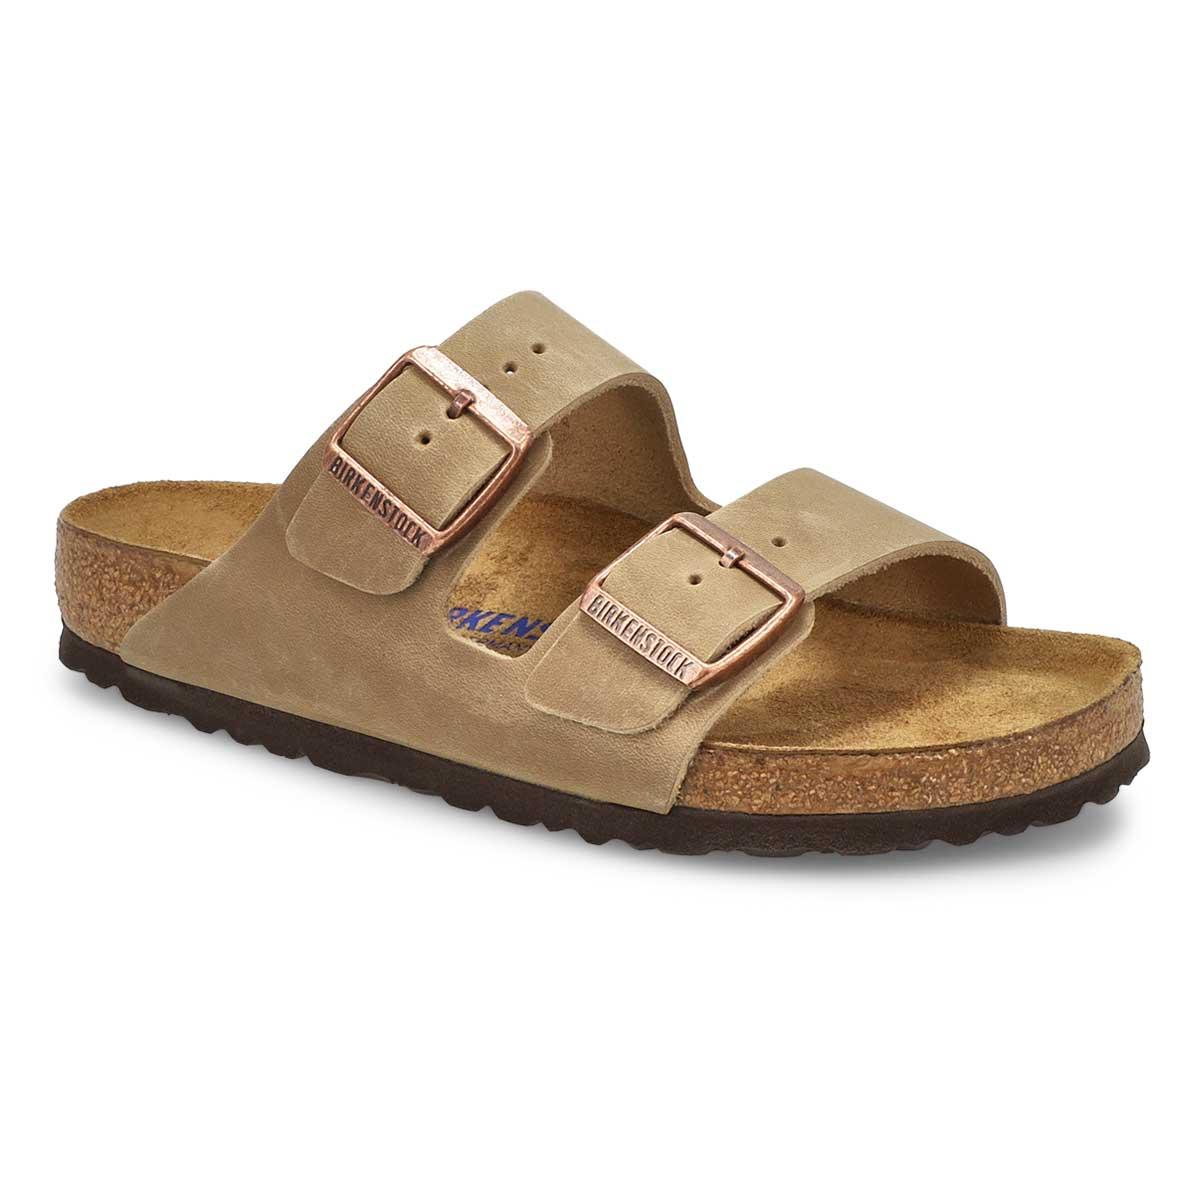 Sandales 2brides ARIZONA SF, tabac, femmes